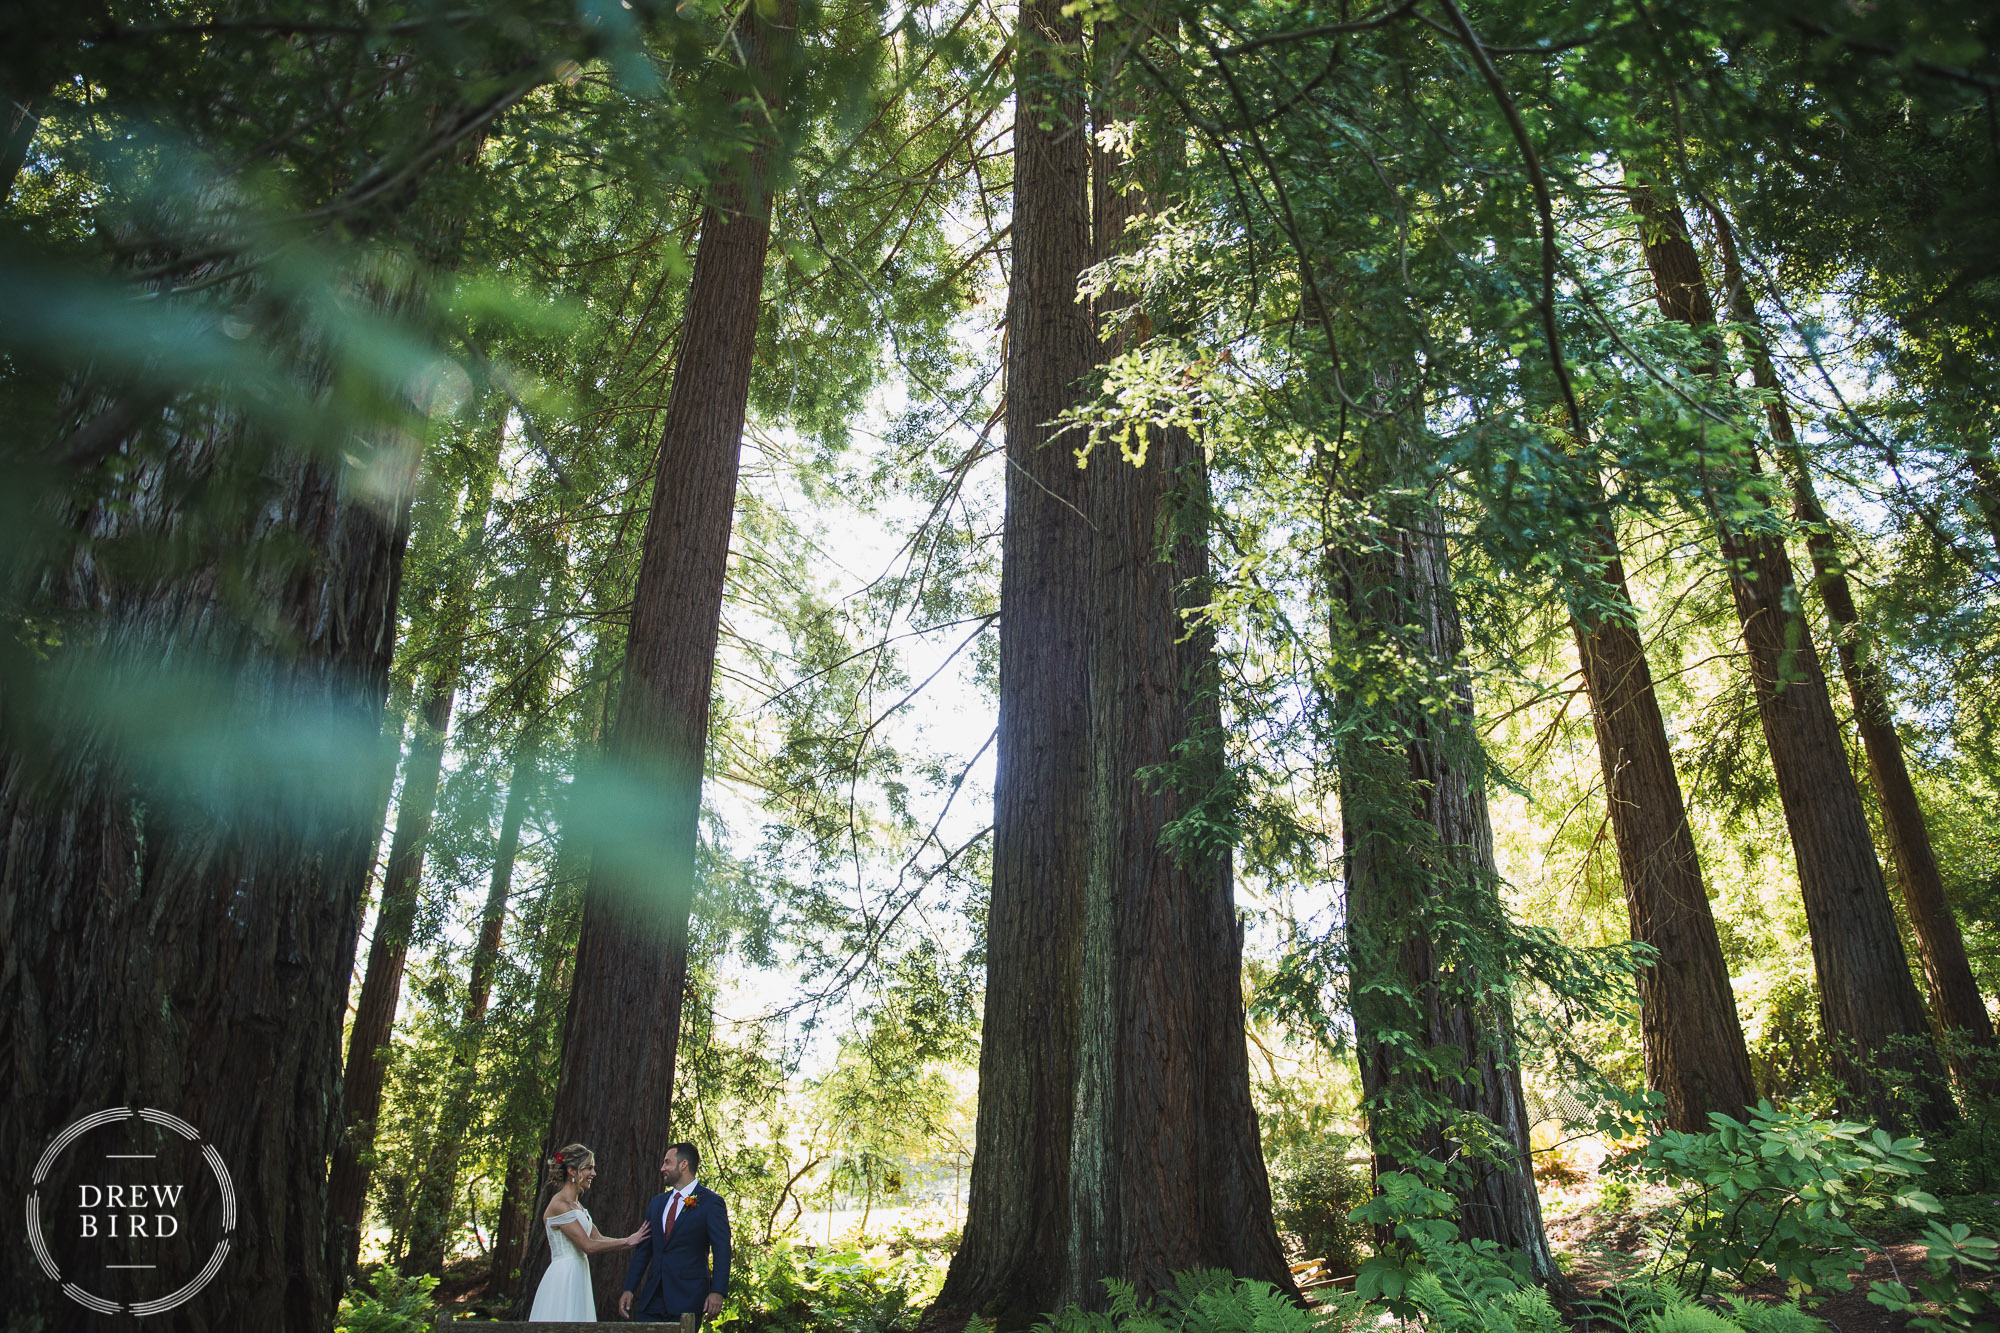 Brazilian room wedding photos. Redwoods wedding photography. Berkeley wedding photojournalism by Drew Bird.